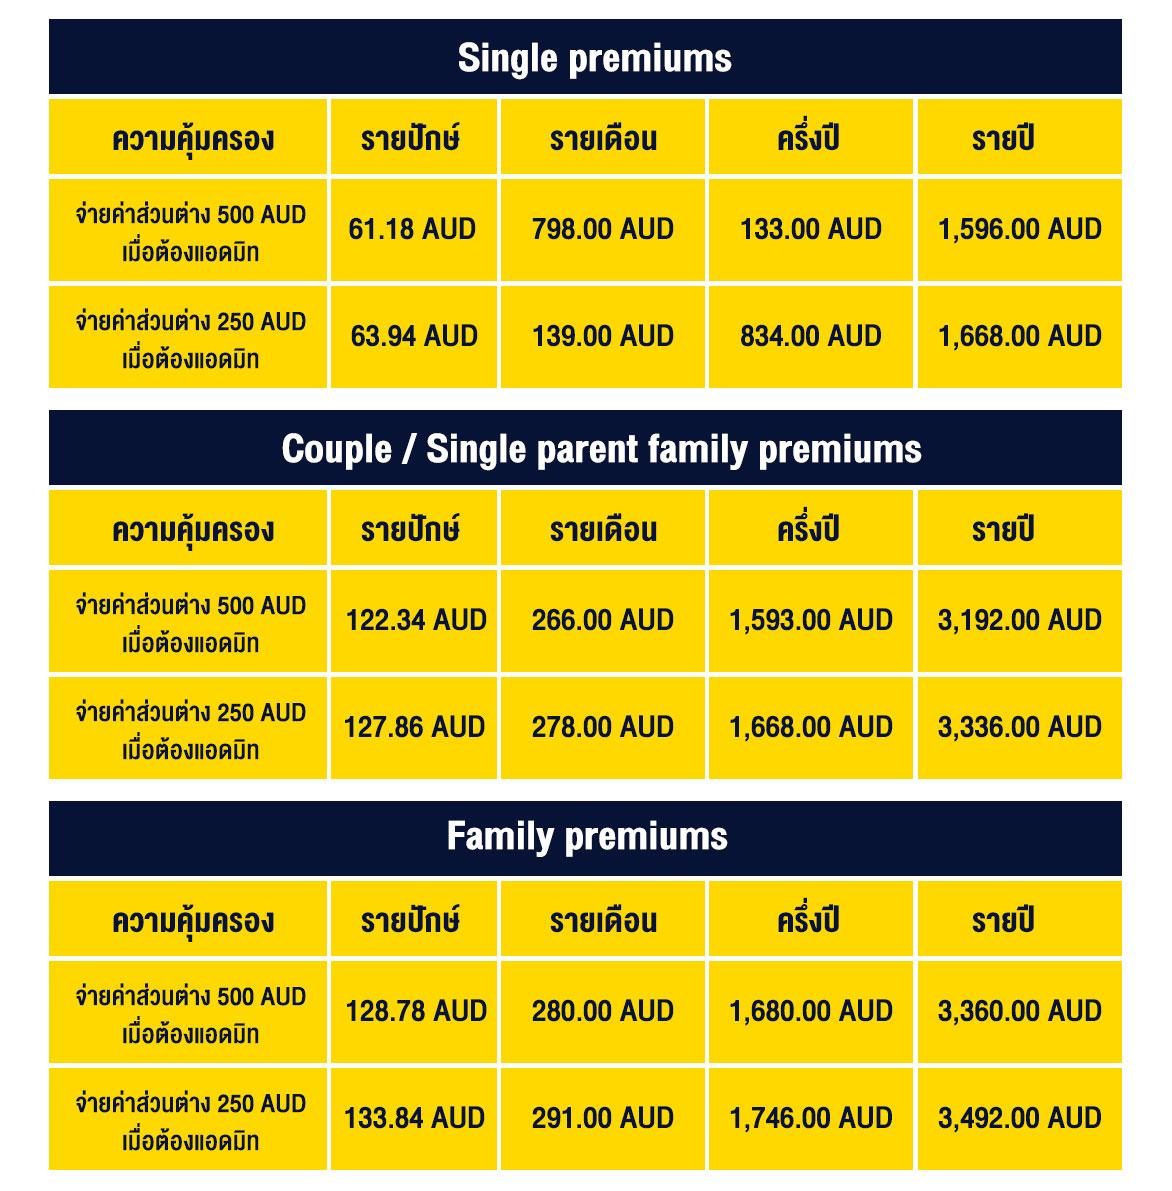 Single-premiums